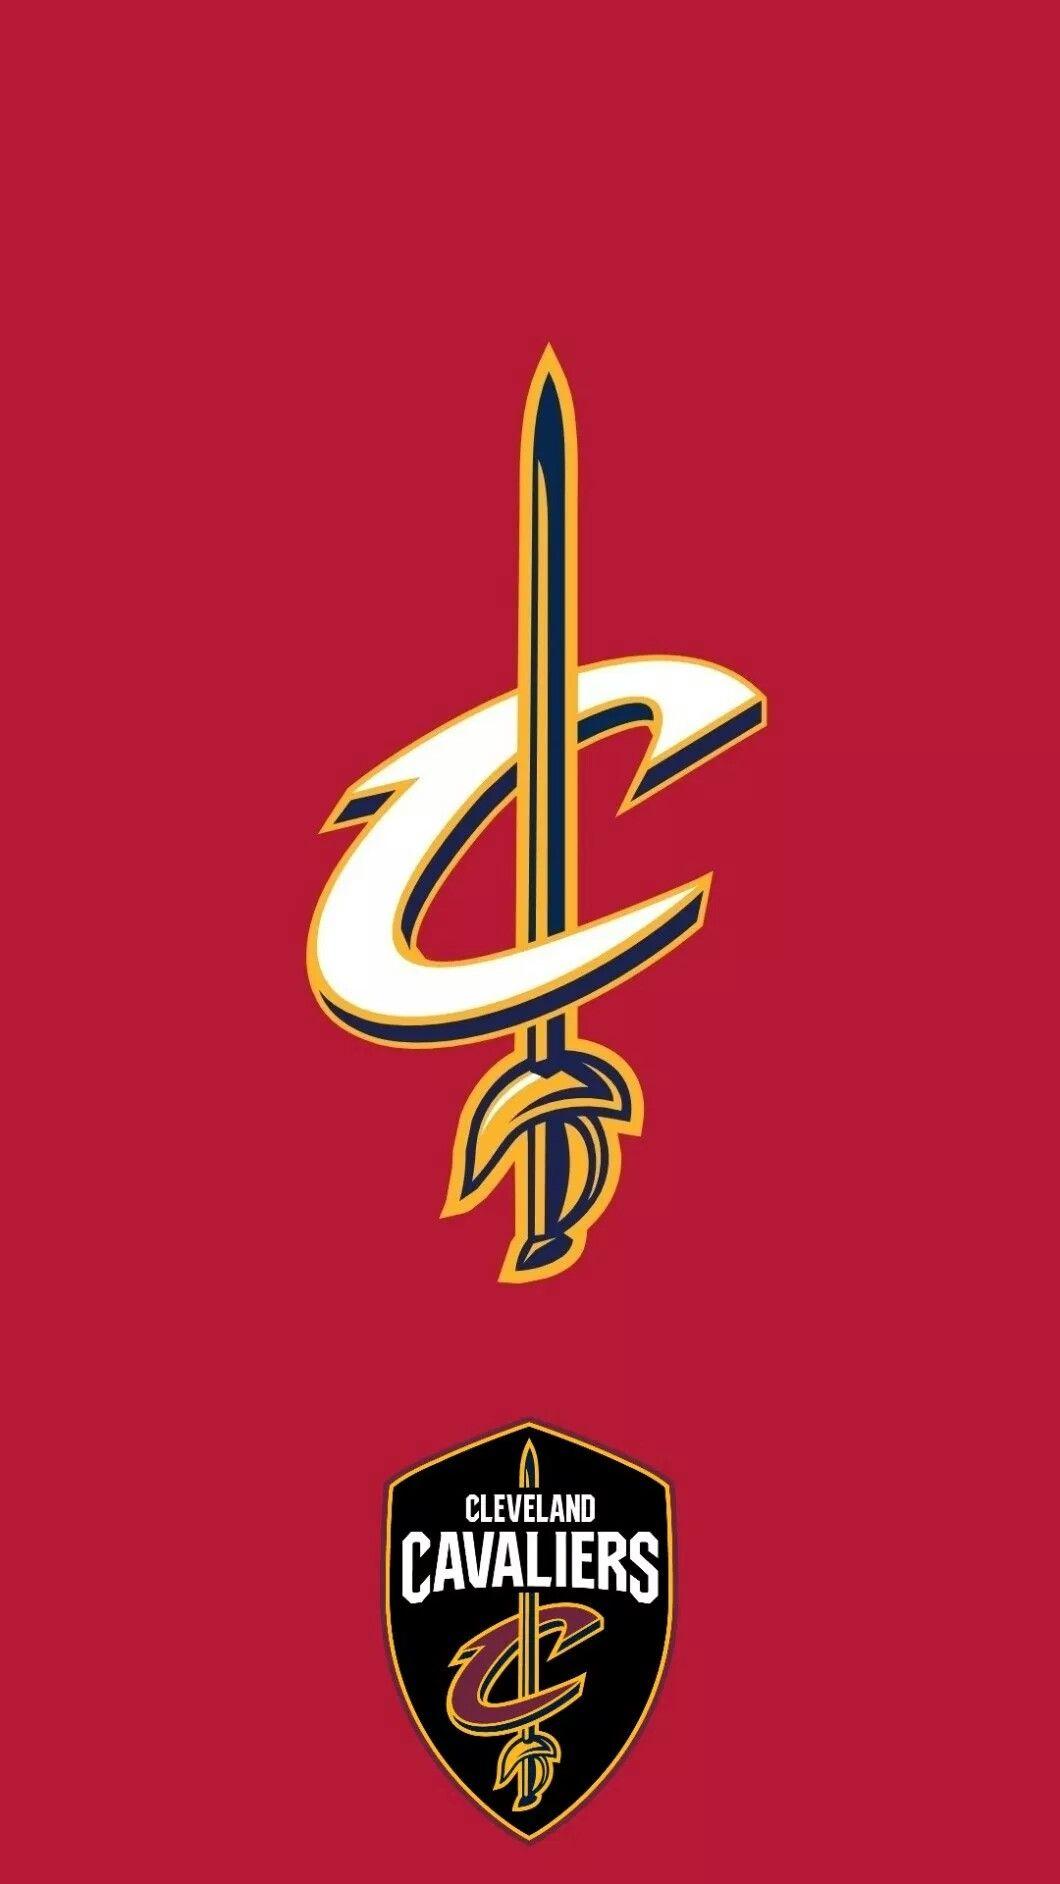 Cleveland Cavaliers Basketball Wallpaper Basketball Wallpapers Hd Nba Wallpapers